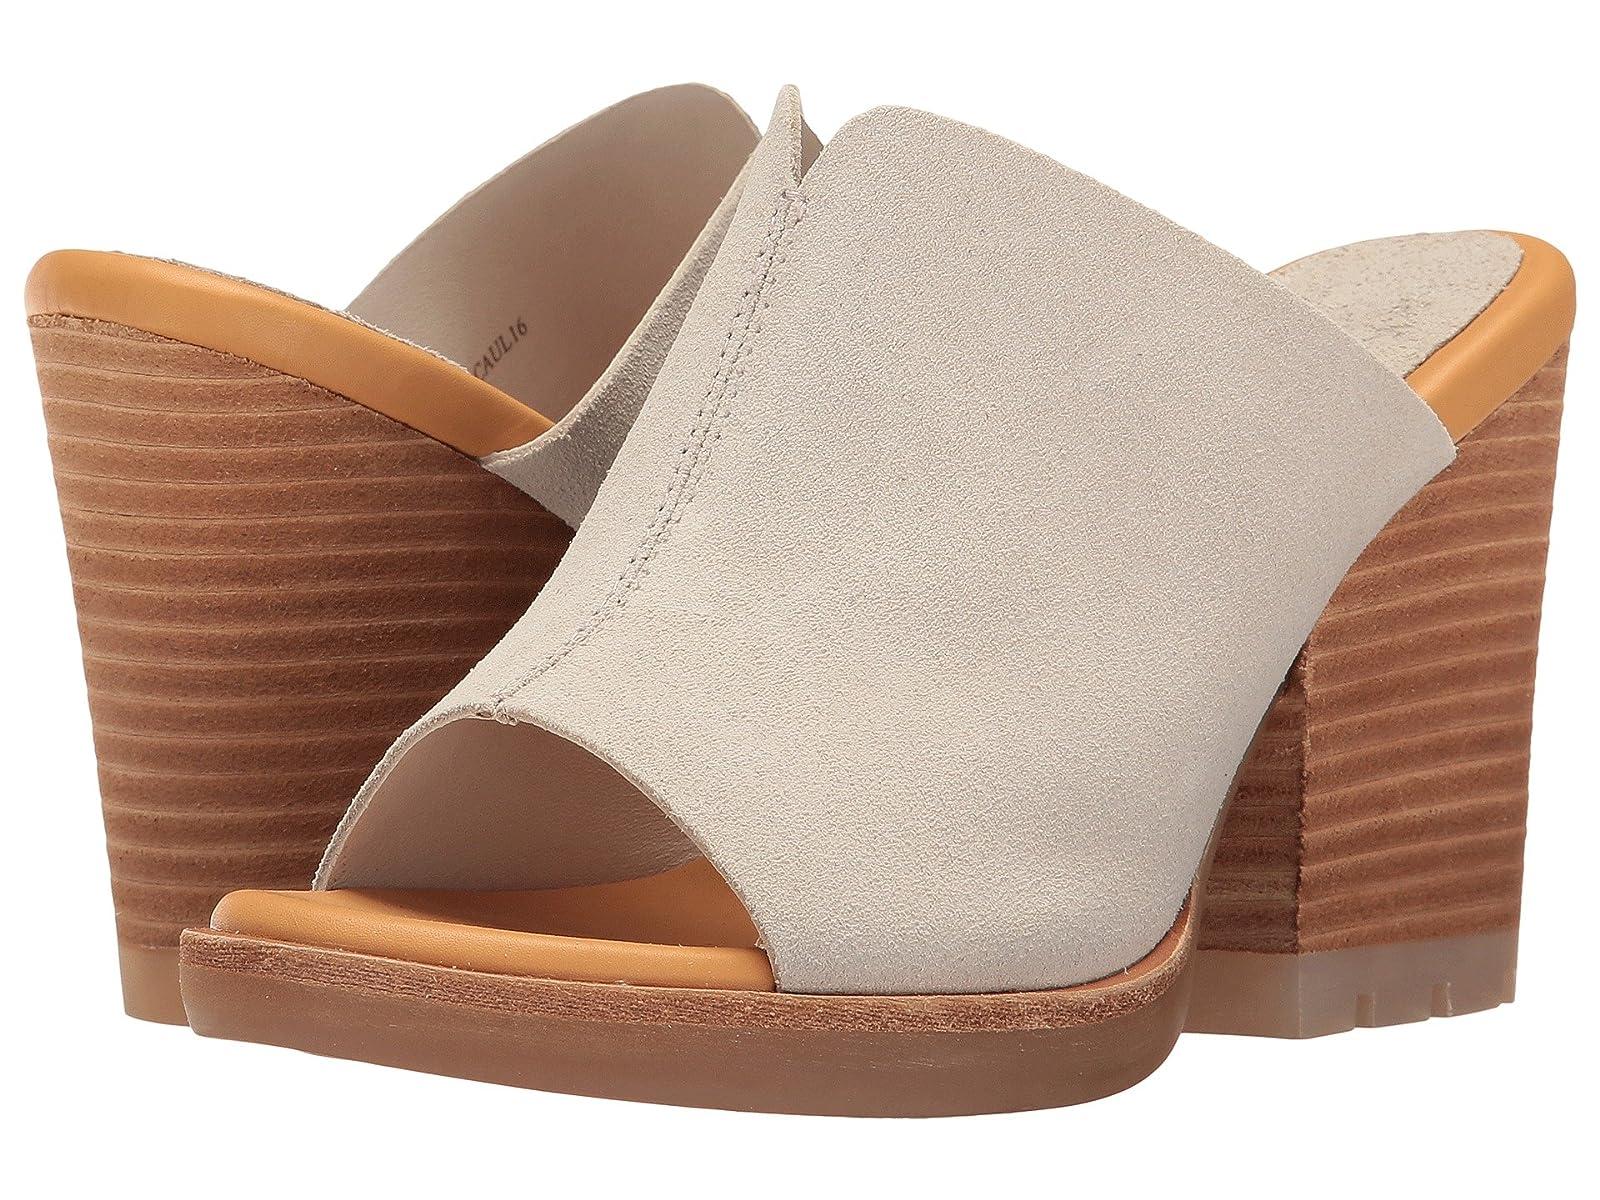 Kork-Ease LawtonCheap and distinctive eye-catching shoes